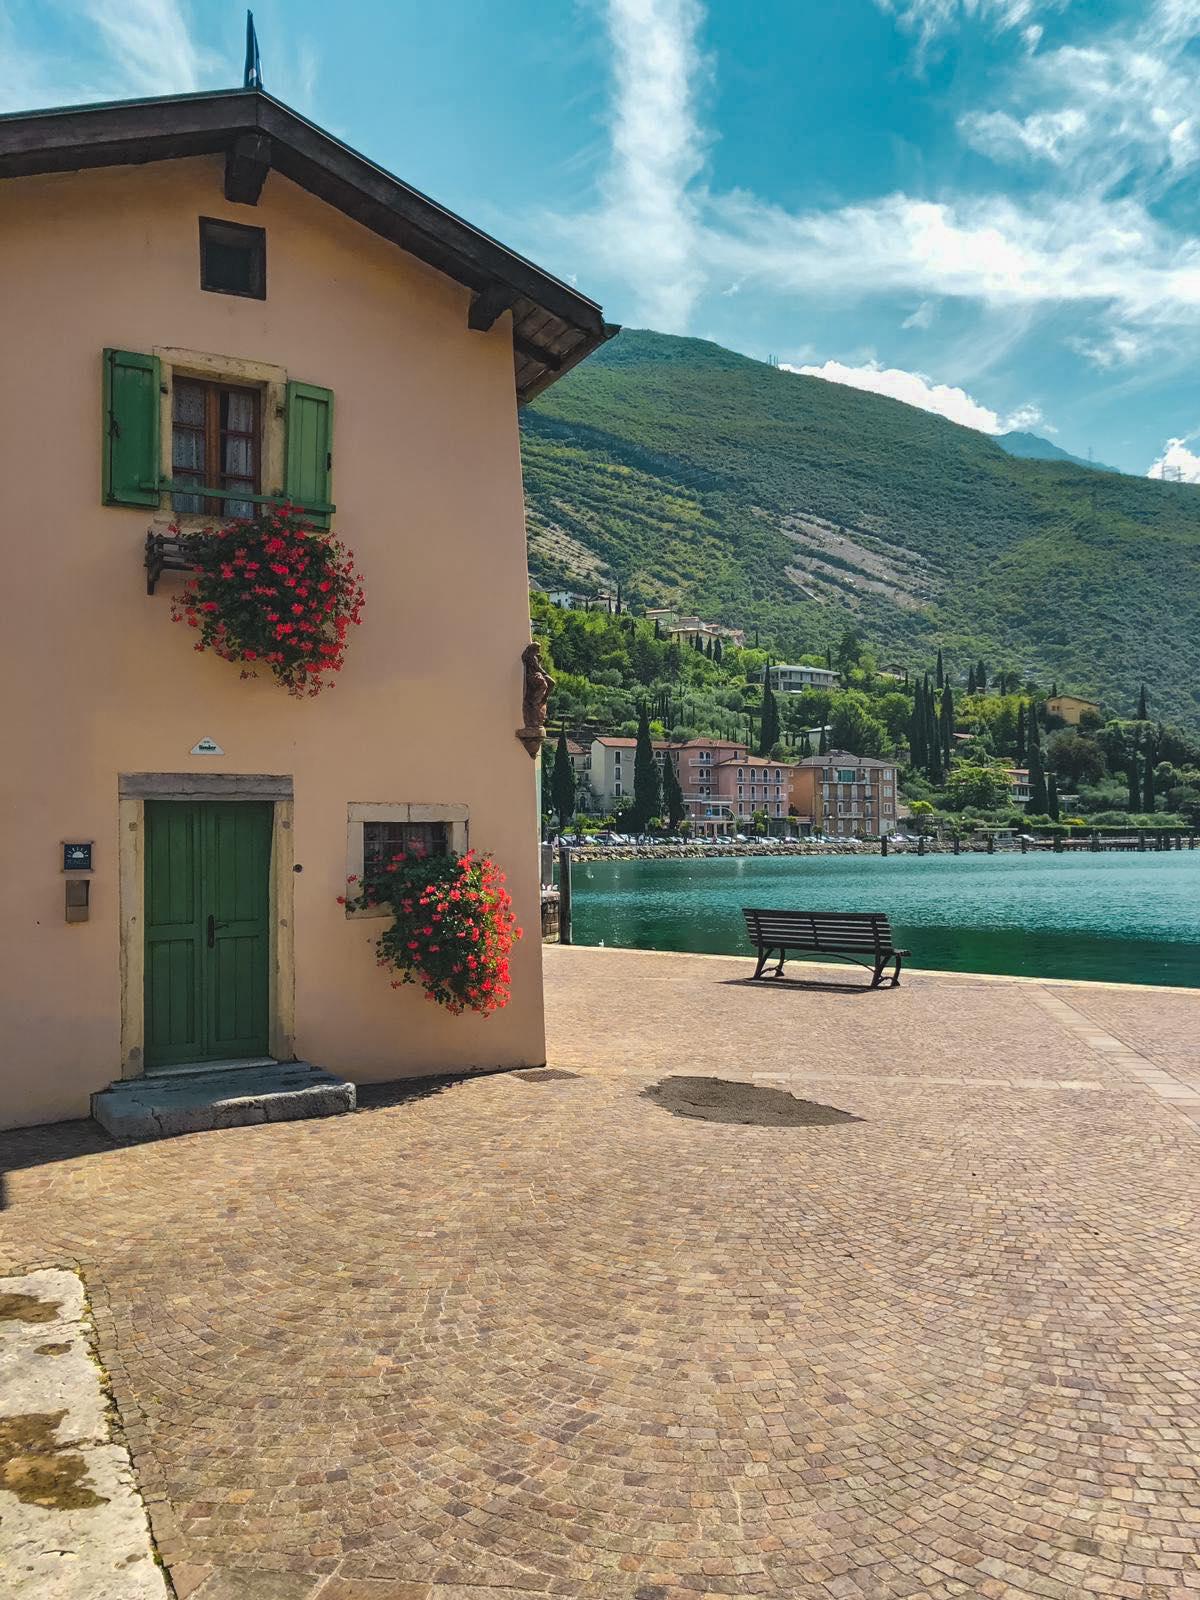 Life On The Road Day 131 Hello from Lago di Garda, ITALY23.jpg